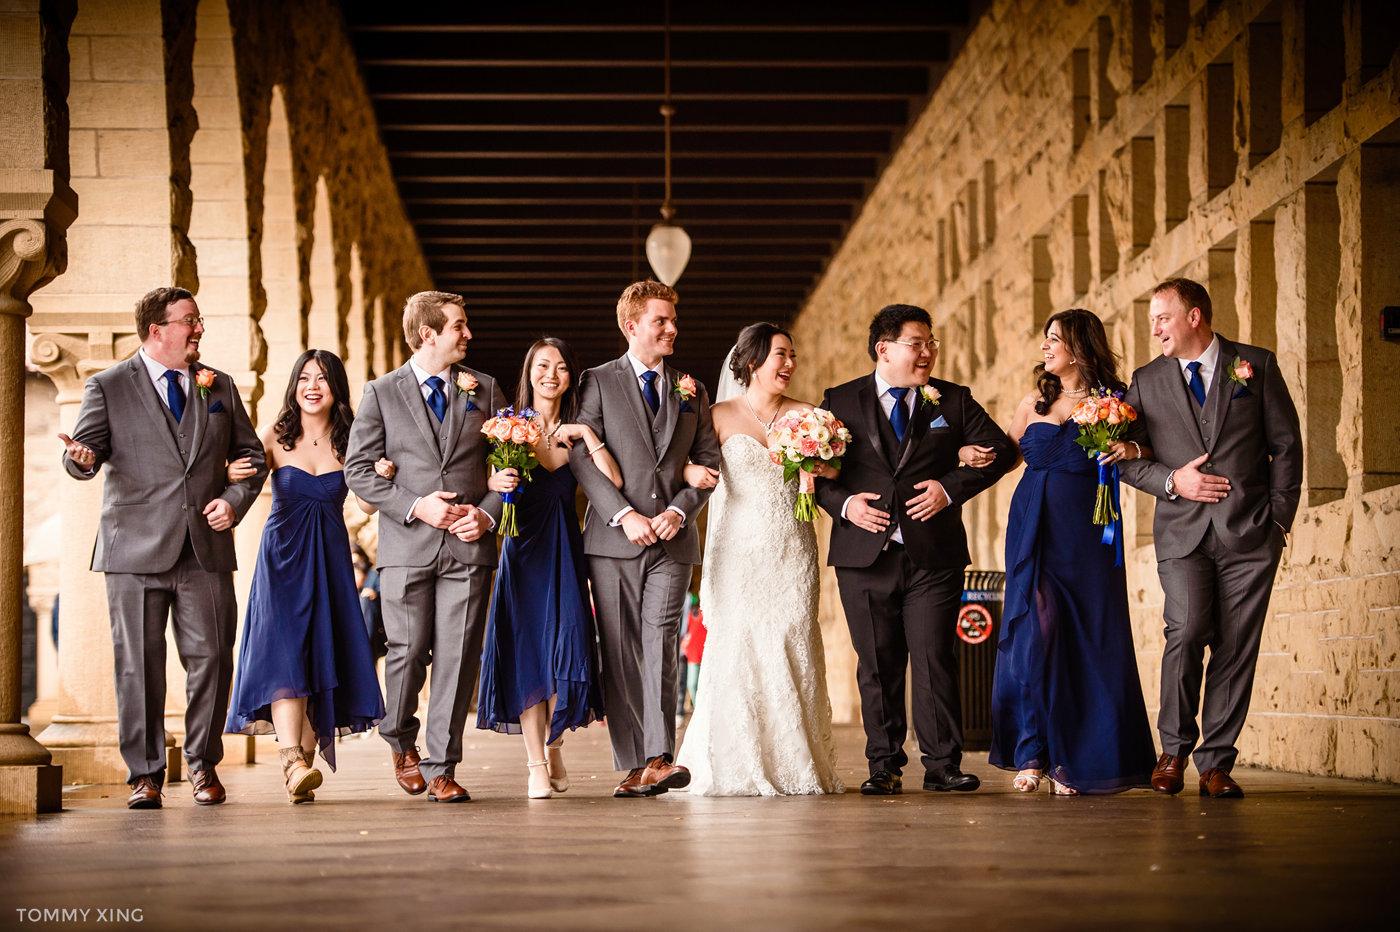 STANFORD MEMORIAL CHURCH WEDDING - Wenjie & Chengcheng - SAN FRANCISCO BAY AREA 斯坦福教堂婚礼跟拍 - 洛杉矶婚礼婚纱照摄影师 Tommy Xing Photography148.jpg